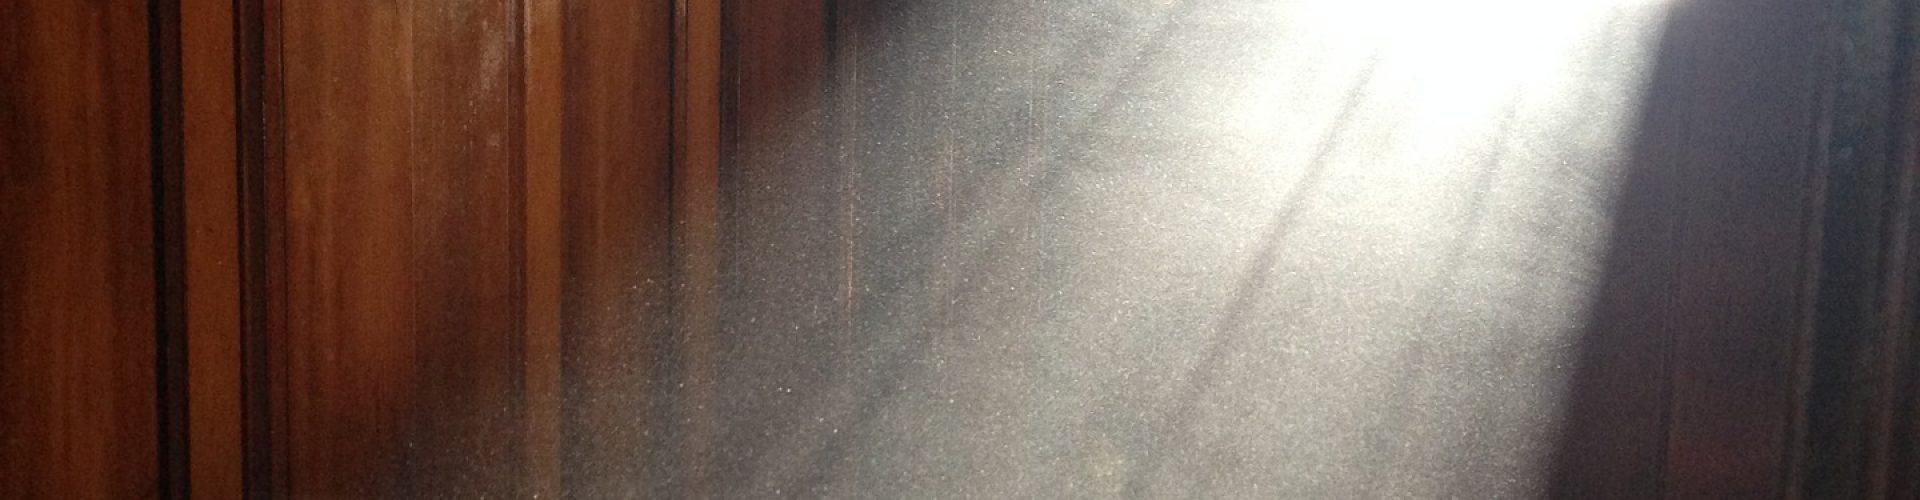 dust-1523106_1920